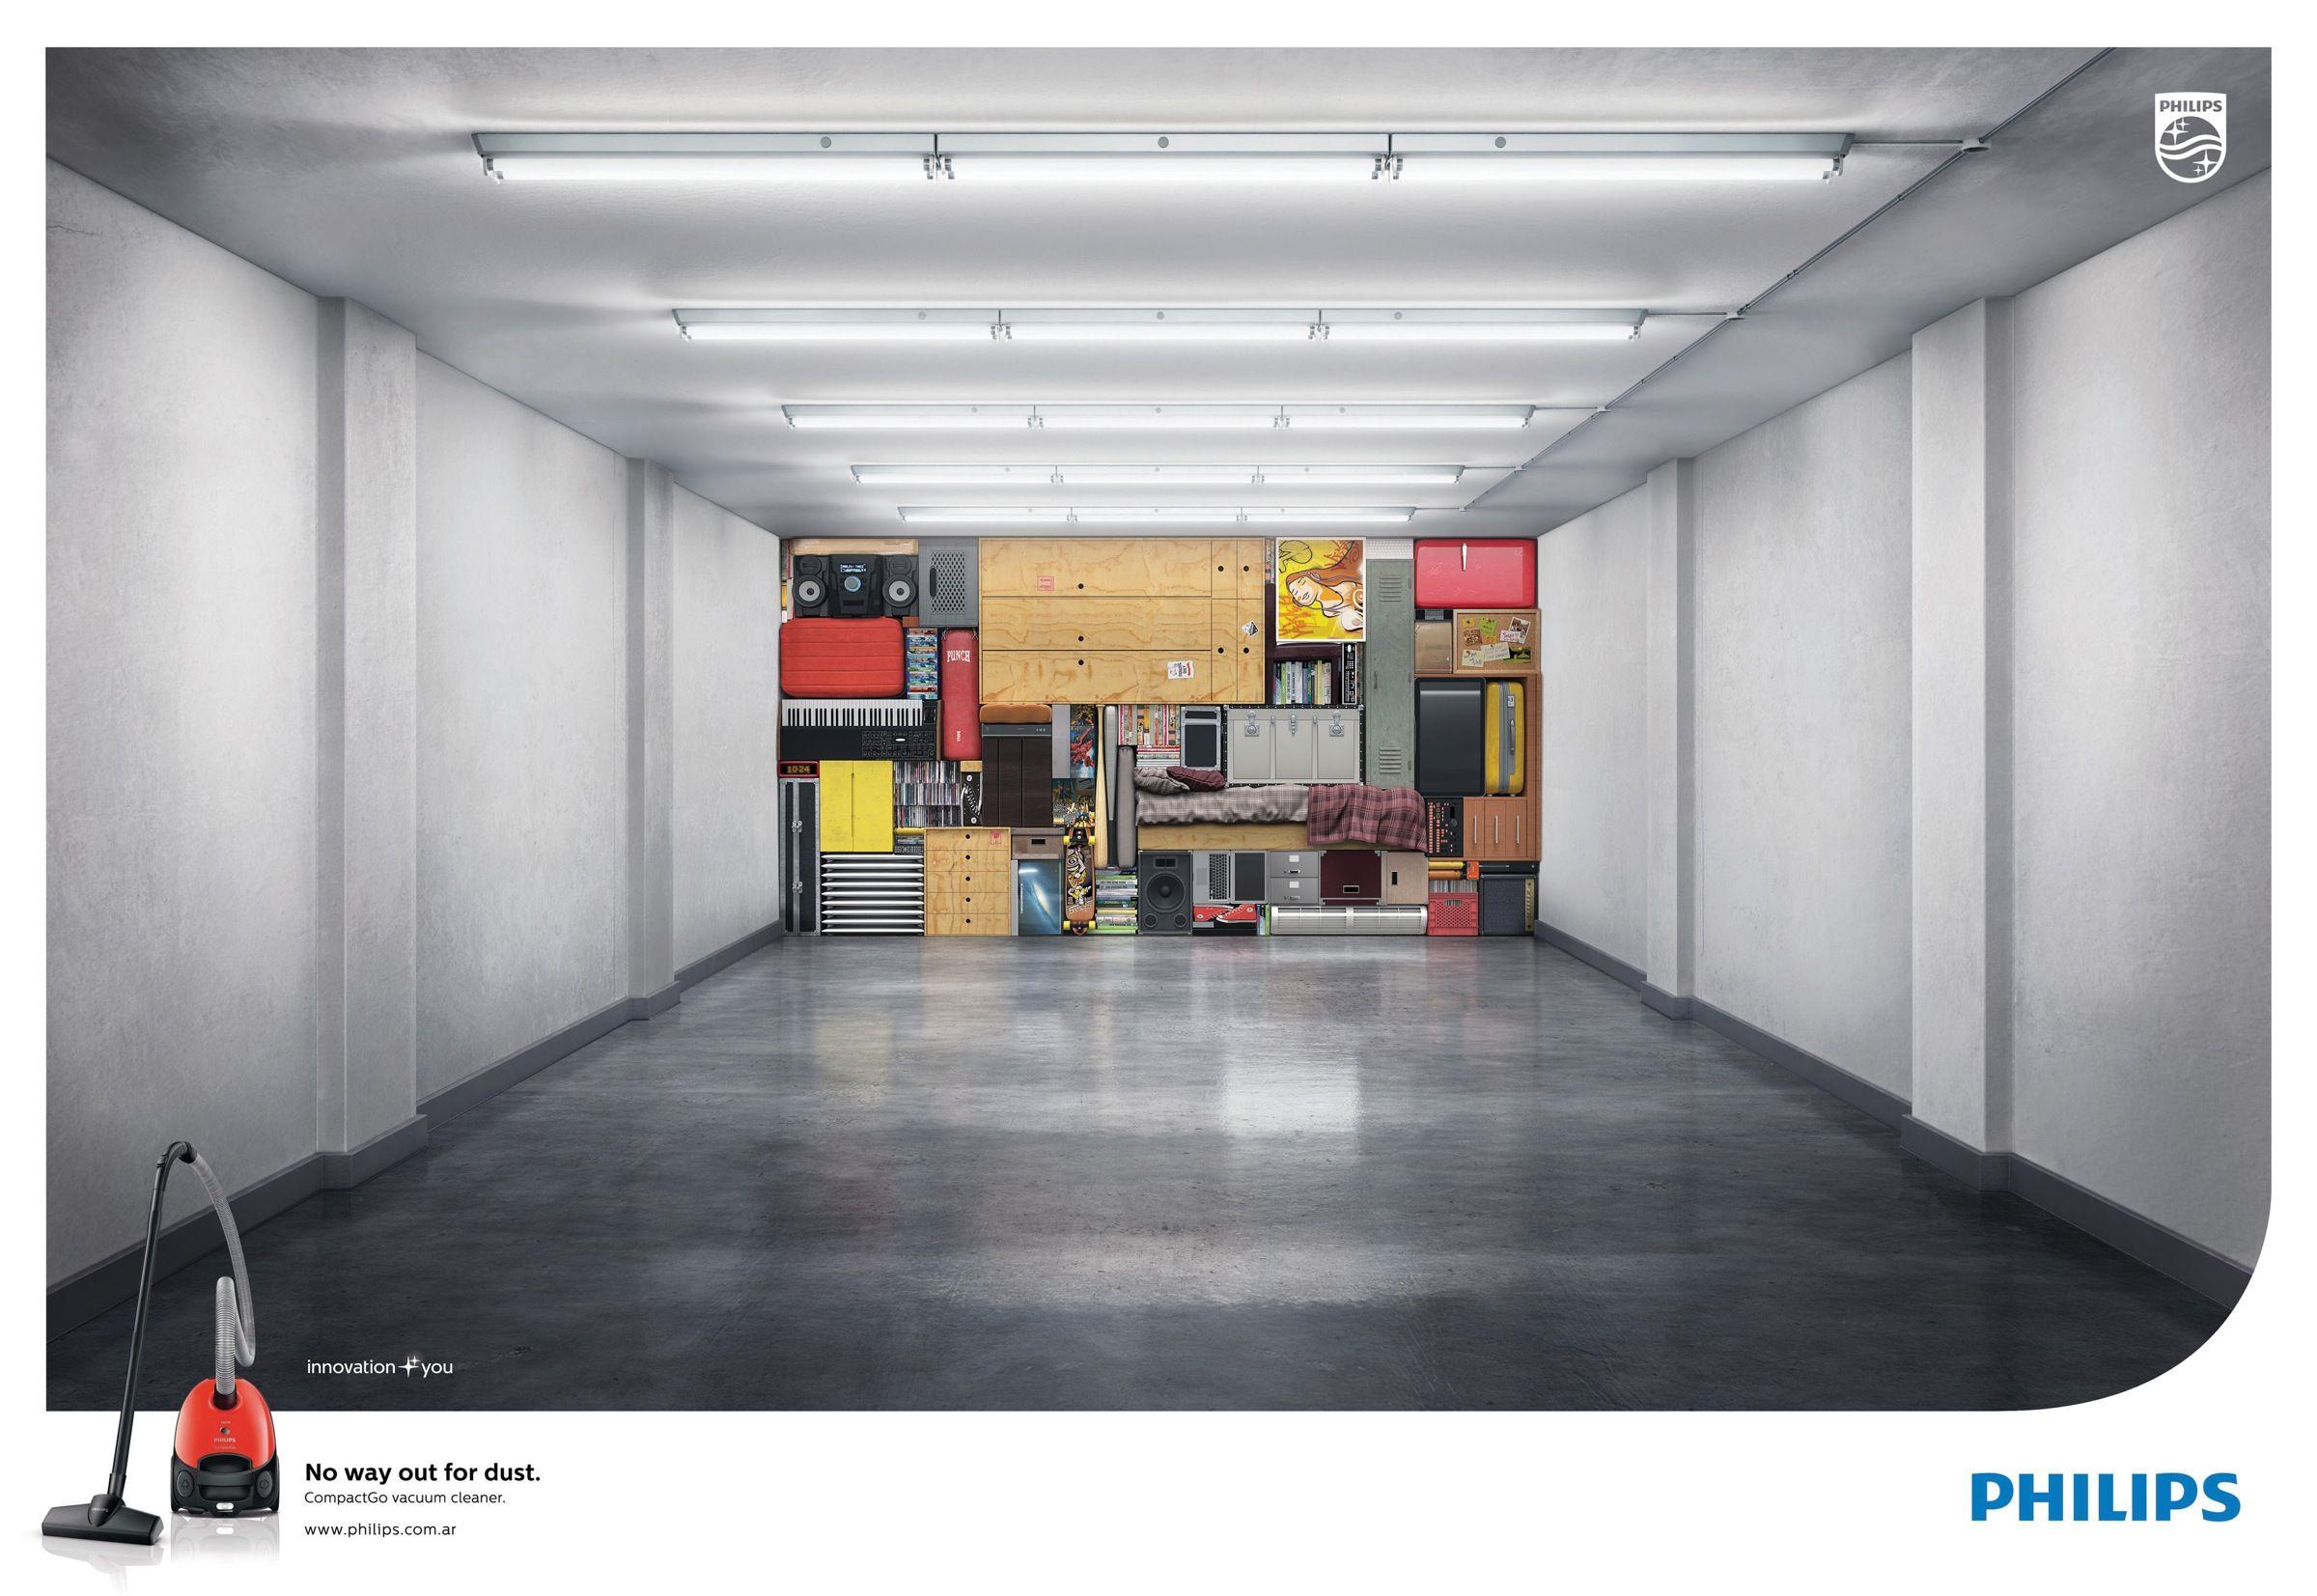 philips-bedroom-office-living-room-print3-adflash